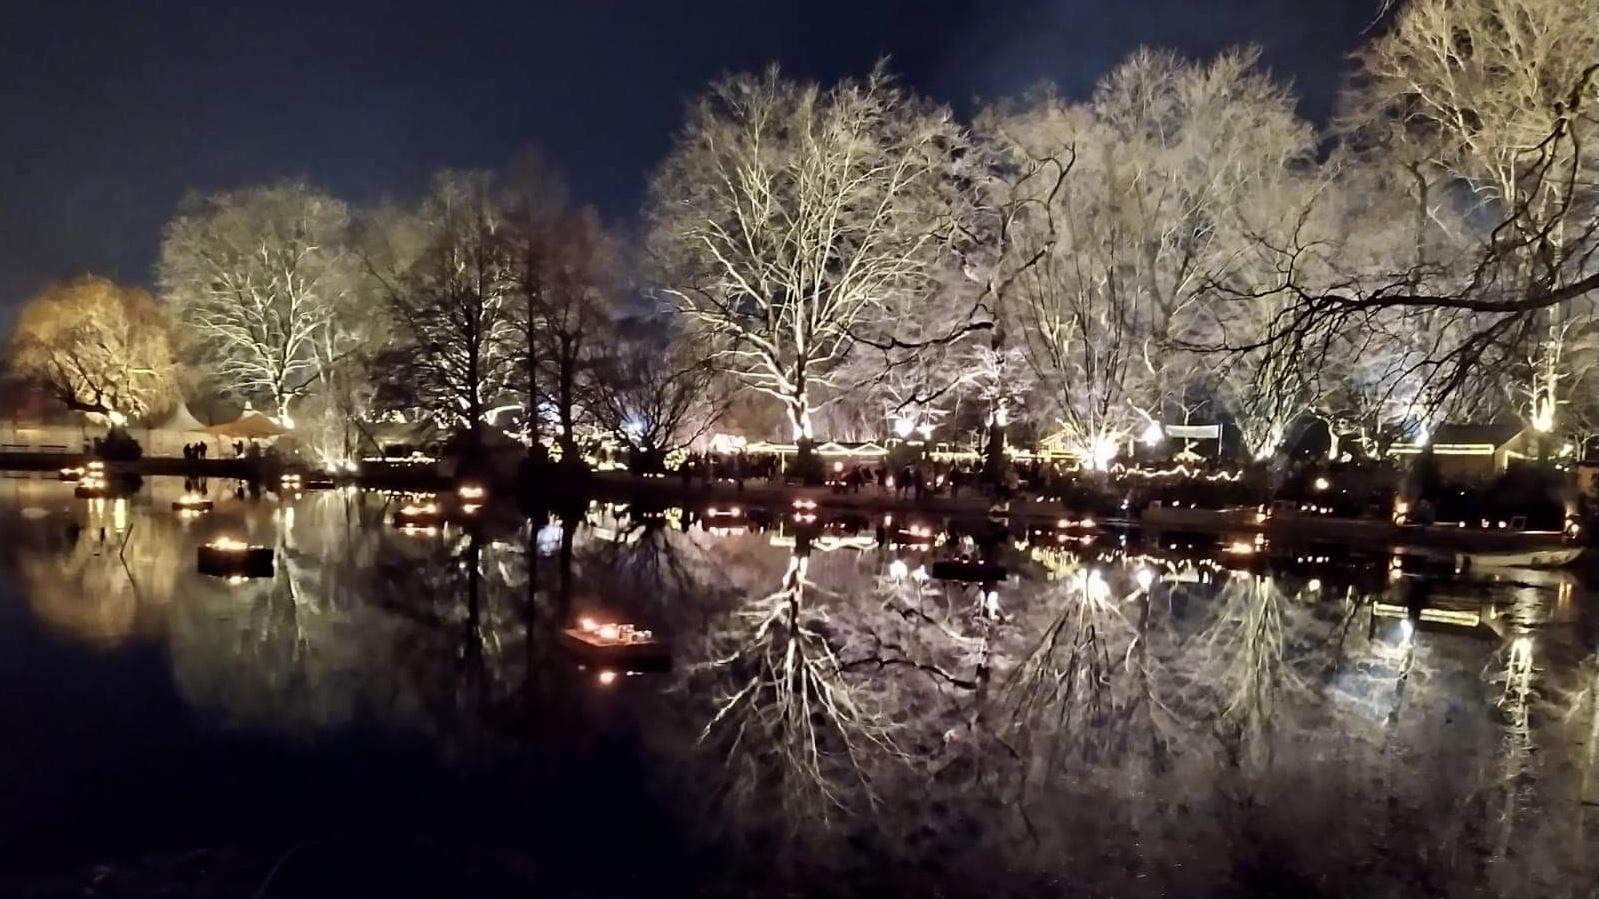 Fredenbaumpark, Dortmund